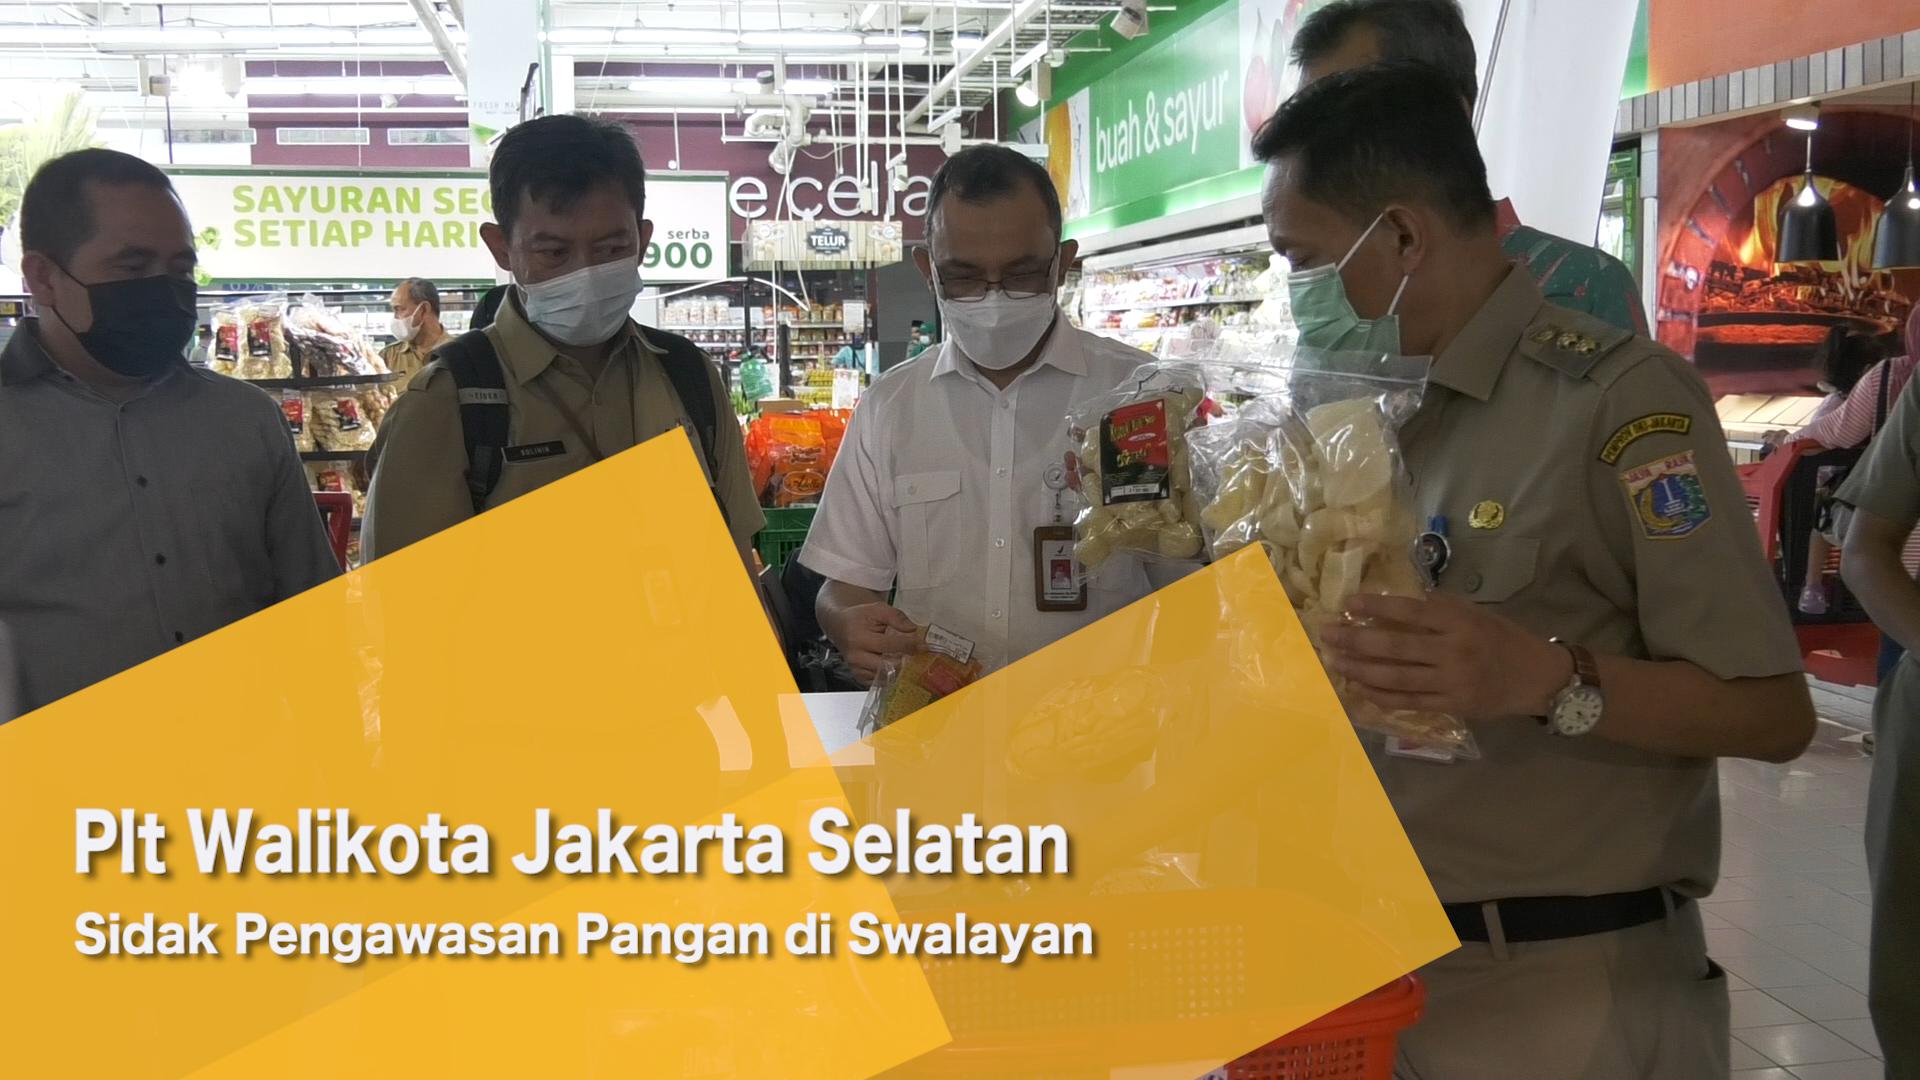 Plt Walikota Jakarta Selatan Sidak Pengawasan Pangan di Swalayan